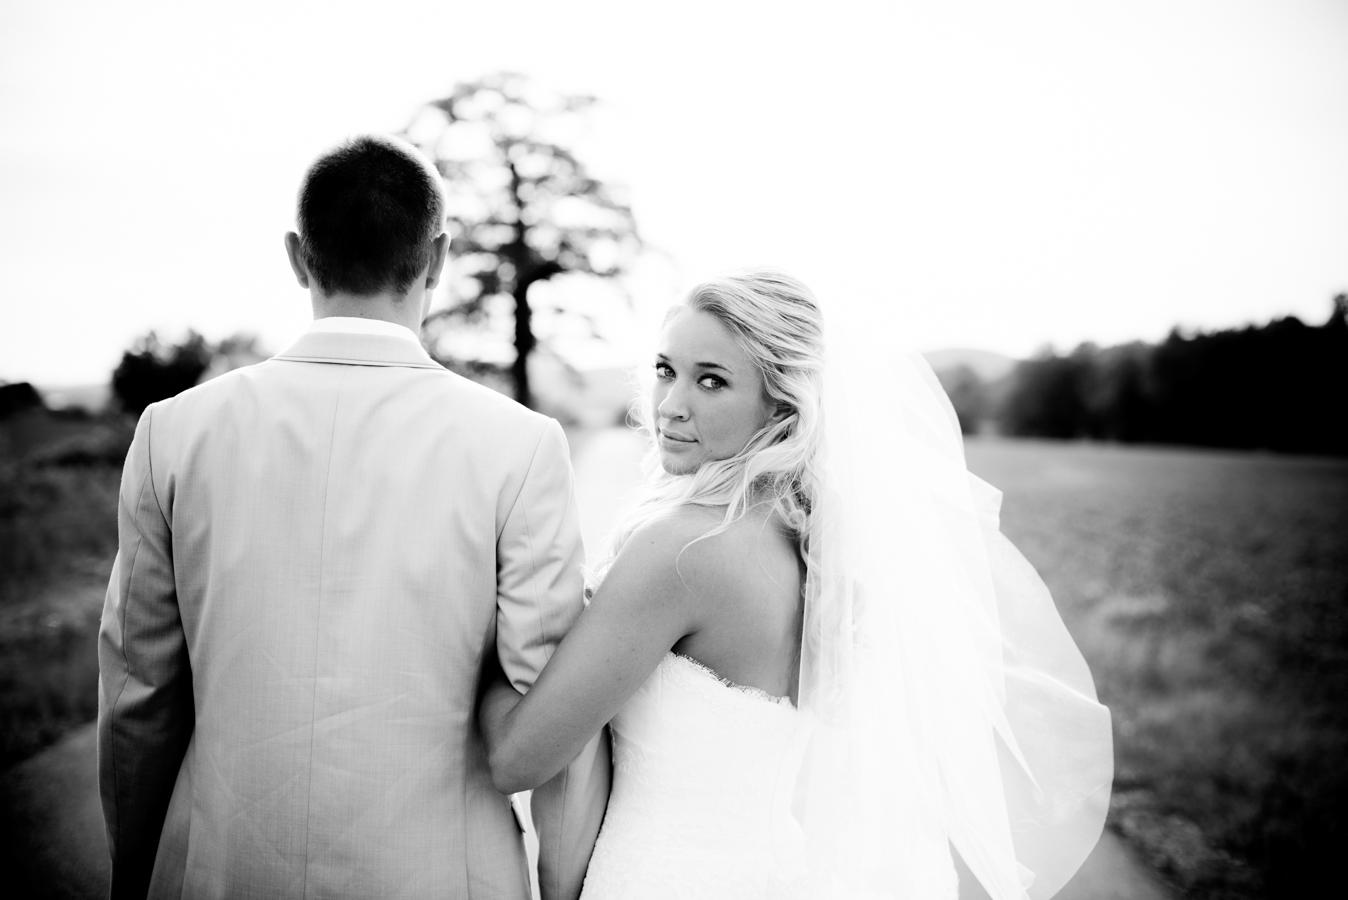 Weddings-in-williamsport-photography.jpg